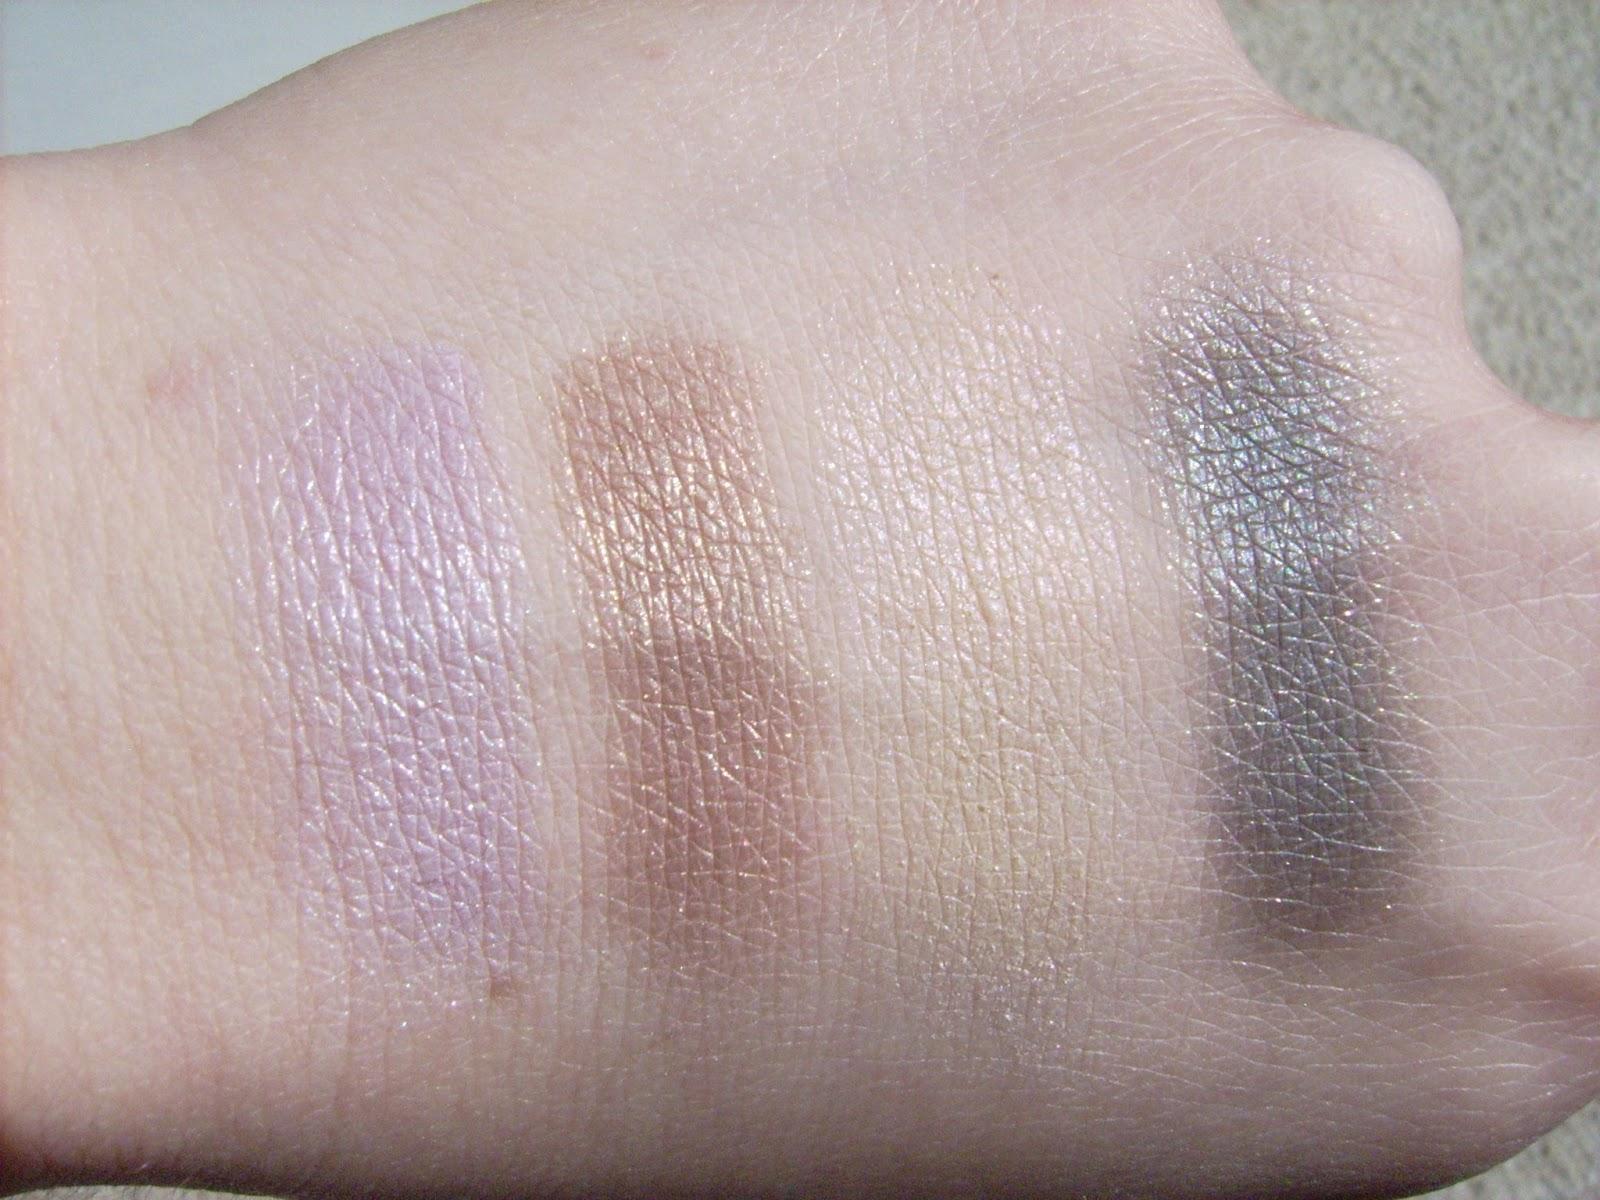 Elizabeth Arden Color Intrigue Eyeshadow Quad Golden Lilac swatch